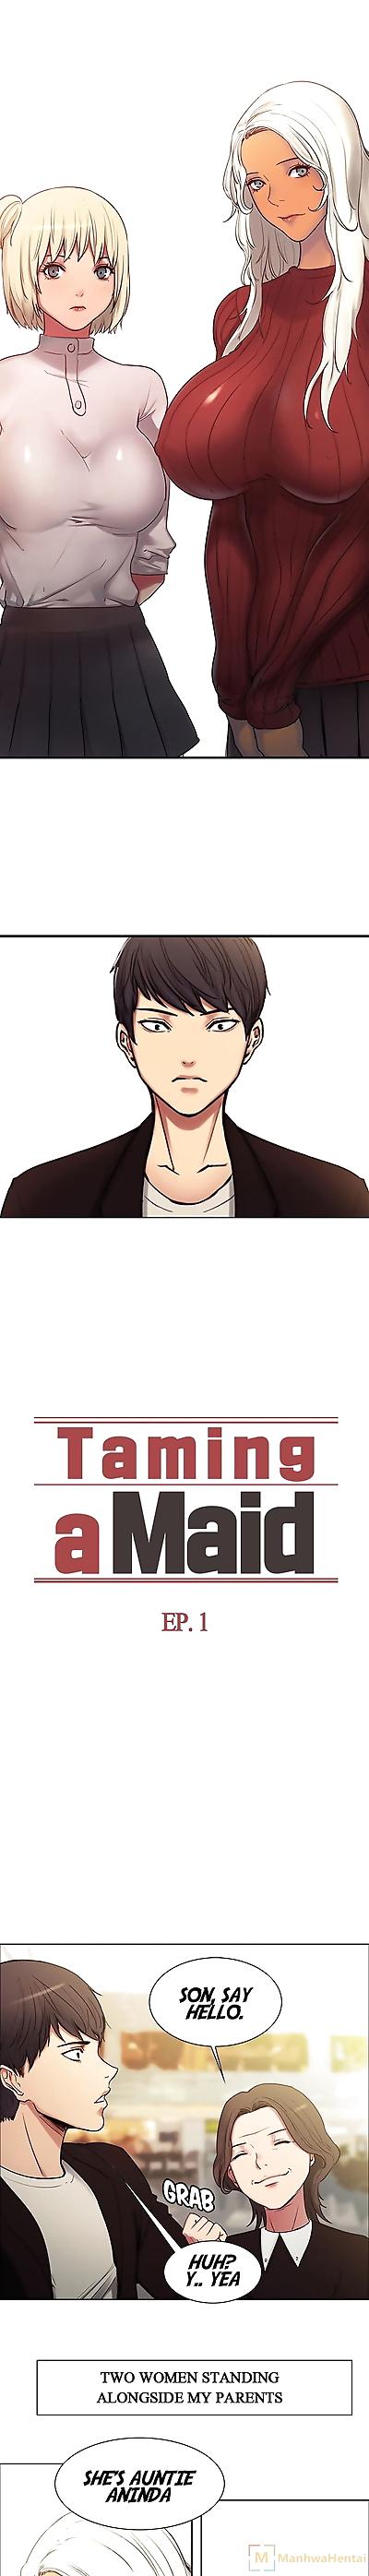 Serious Taming a..